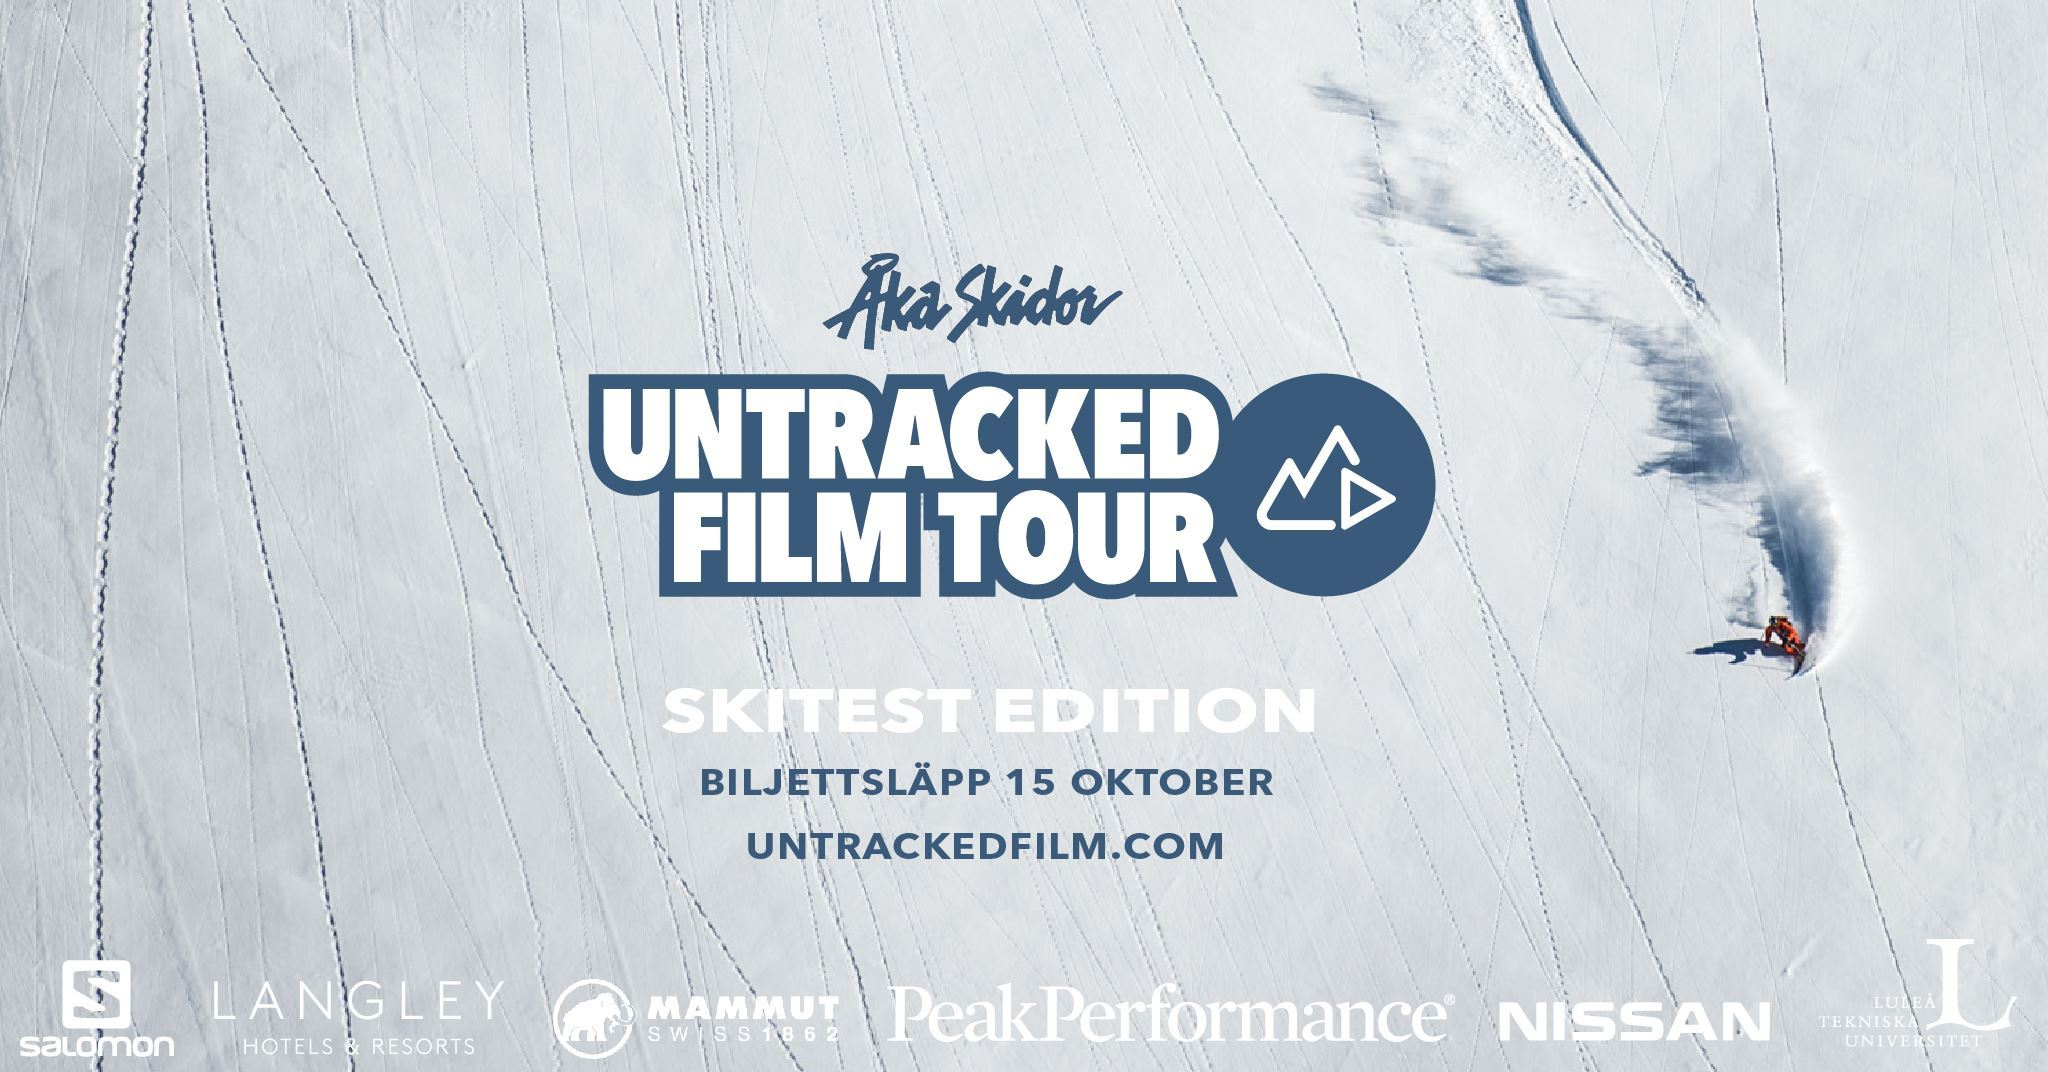 Untracked Film Tour